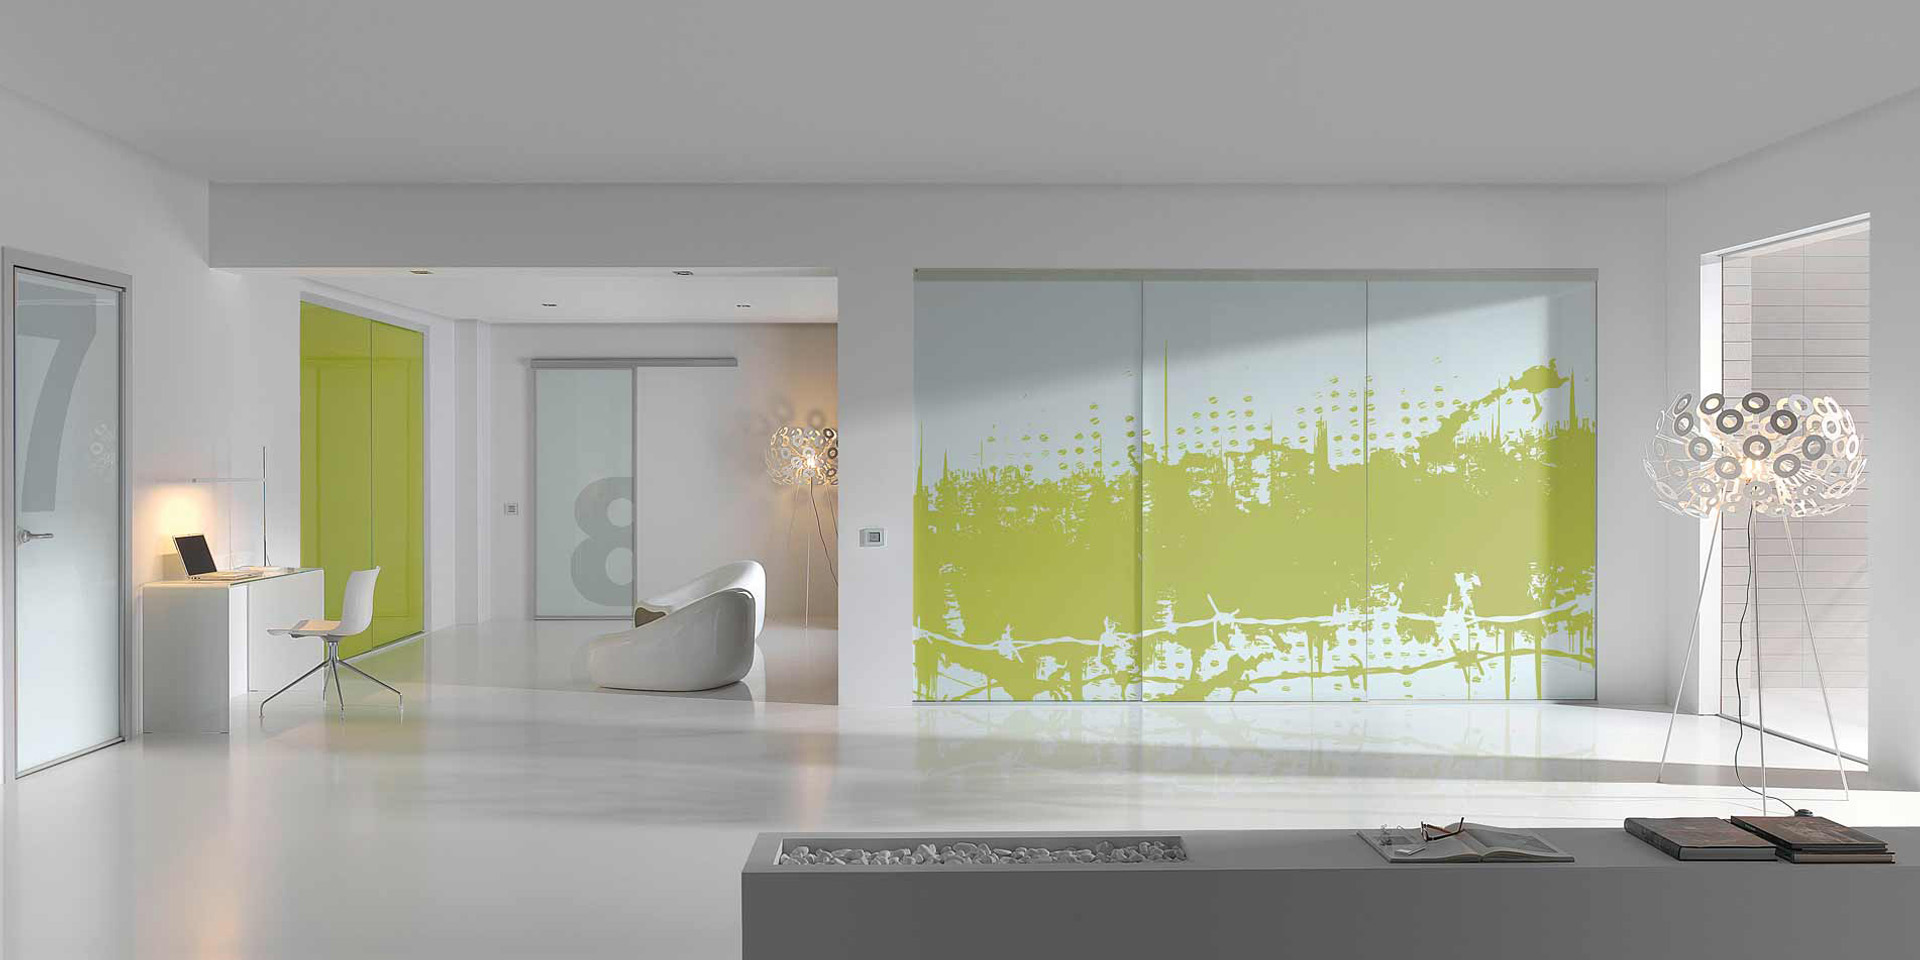 raumplus bei fenchel wohnfaszination gmbh. Black Bedroom Furniture Sets. Home Design Ideas